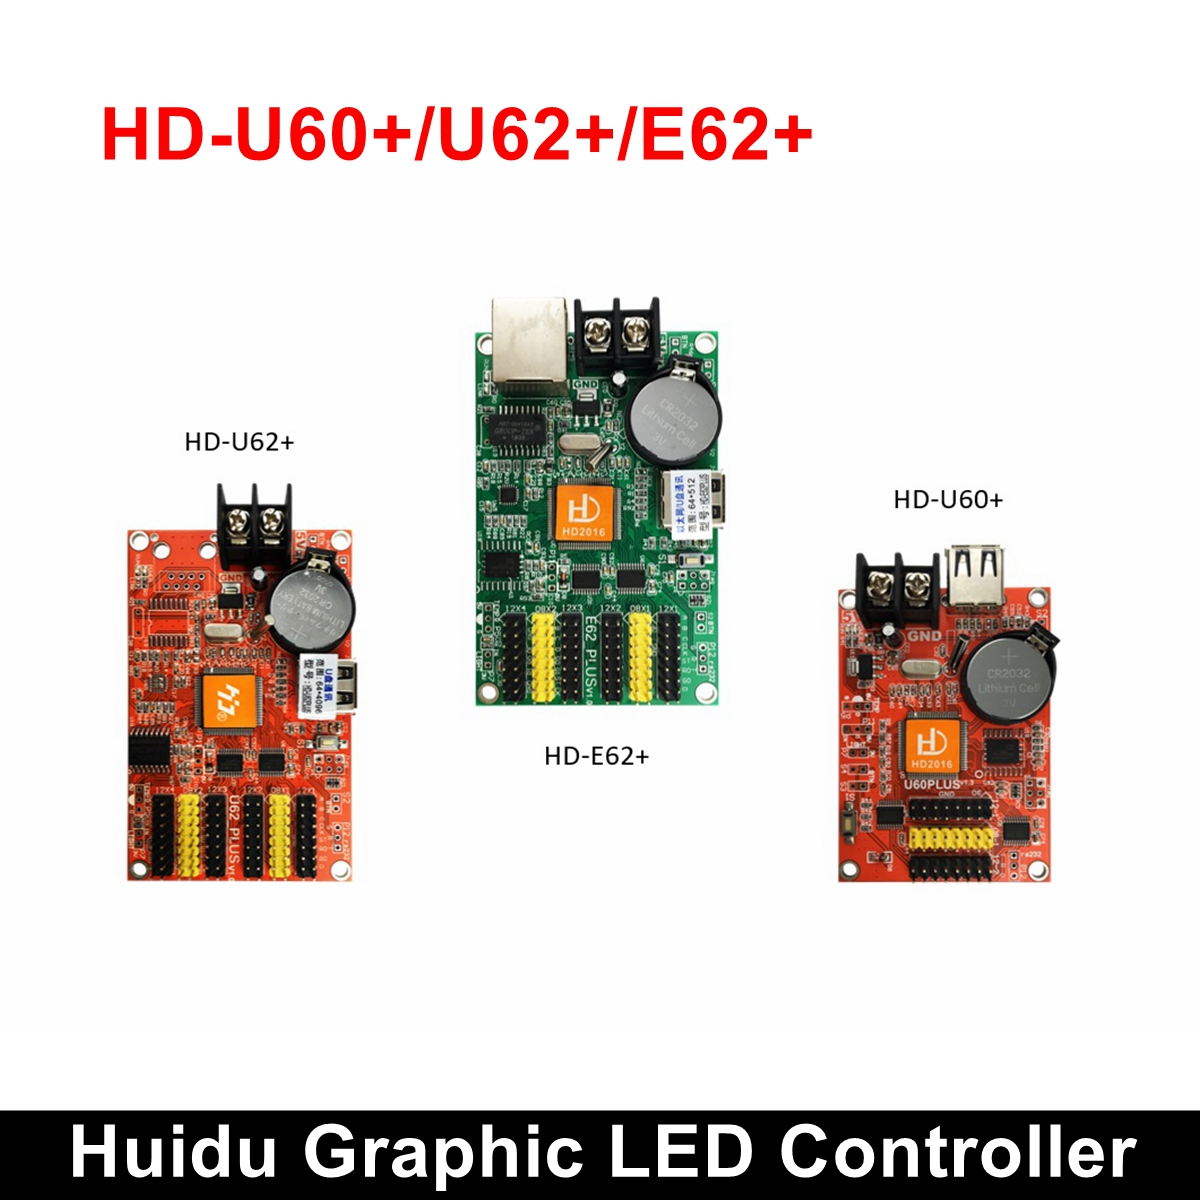 HD-E62 Plus Huidu Single Dual Color Graphic LED Controller HD-U60-75 Full Color Graphic Control Card